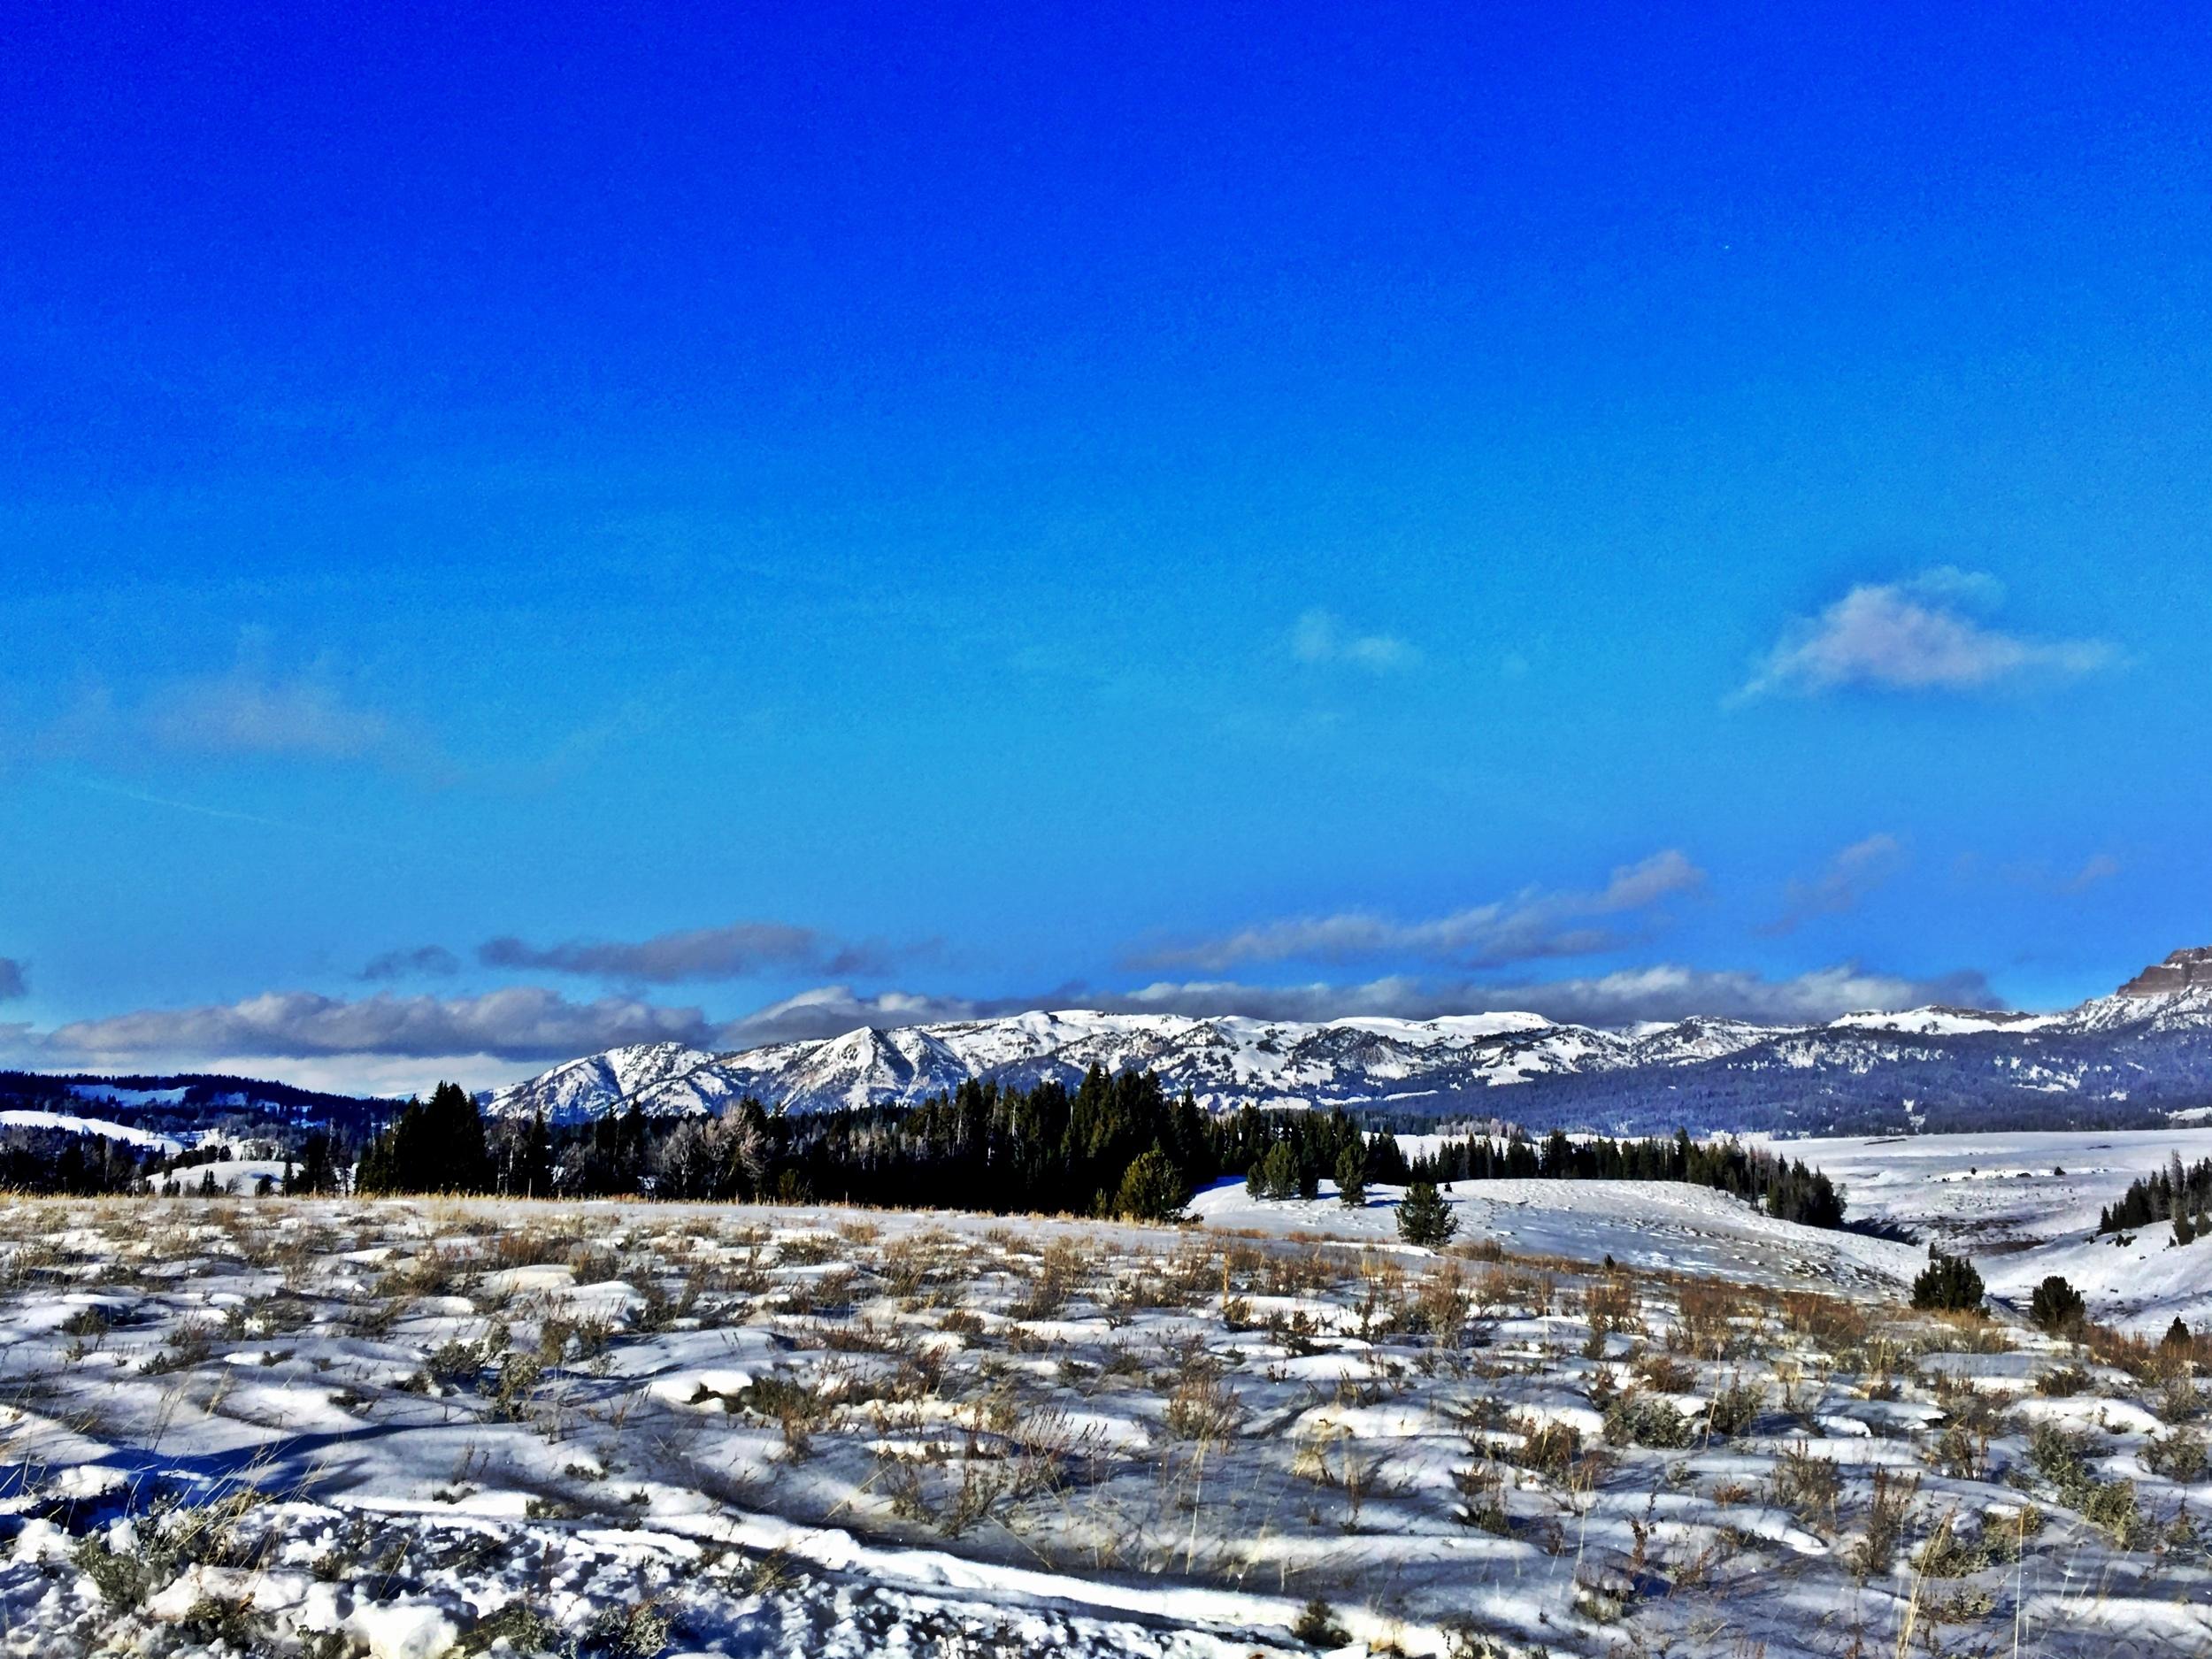 Grungy Slopes, Moran Wyoming, Togwotee Mountain Lodge 21.jpg